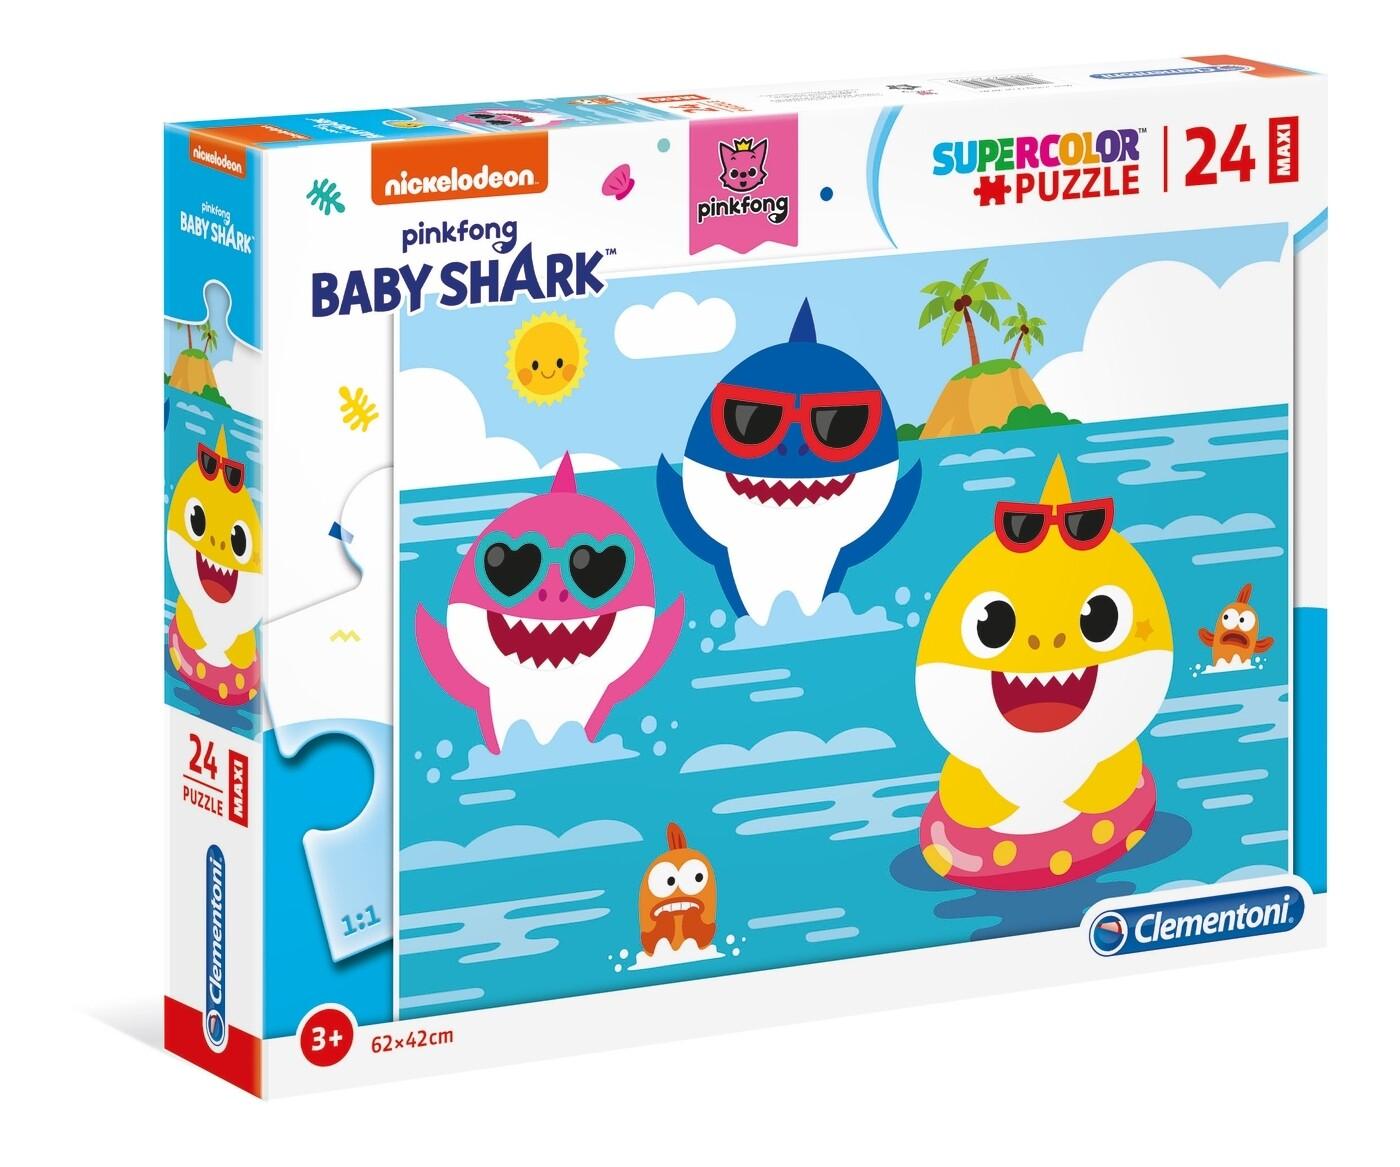 PUZZLE Supercolor MAXI - 24 pcs -Baby Shark - CLEMENTONI